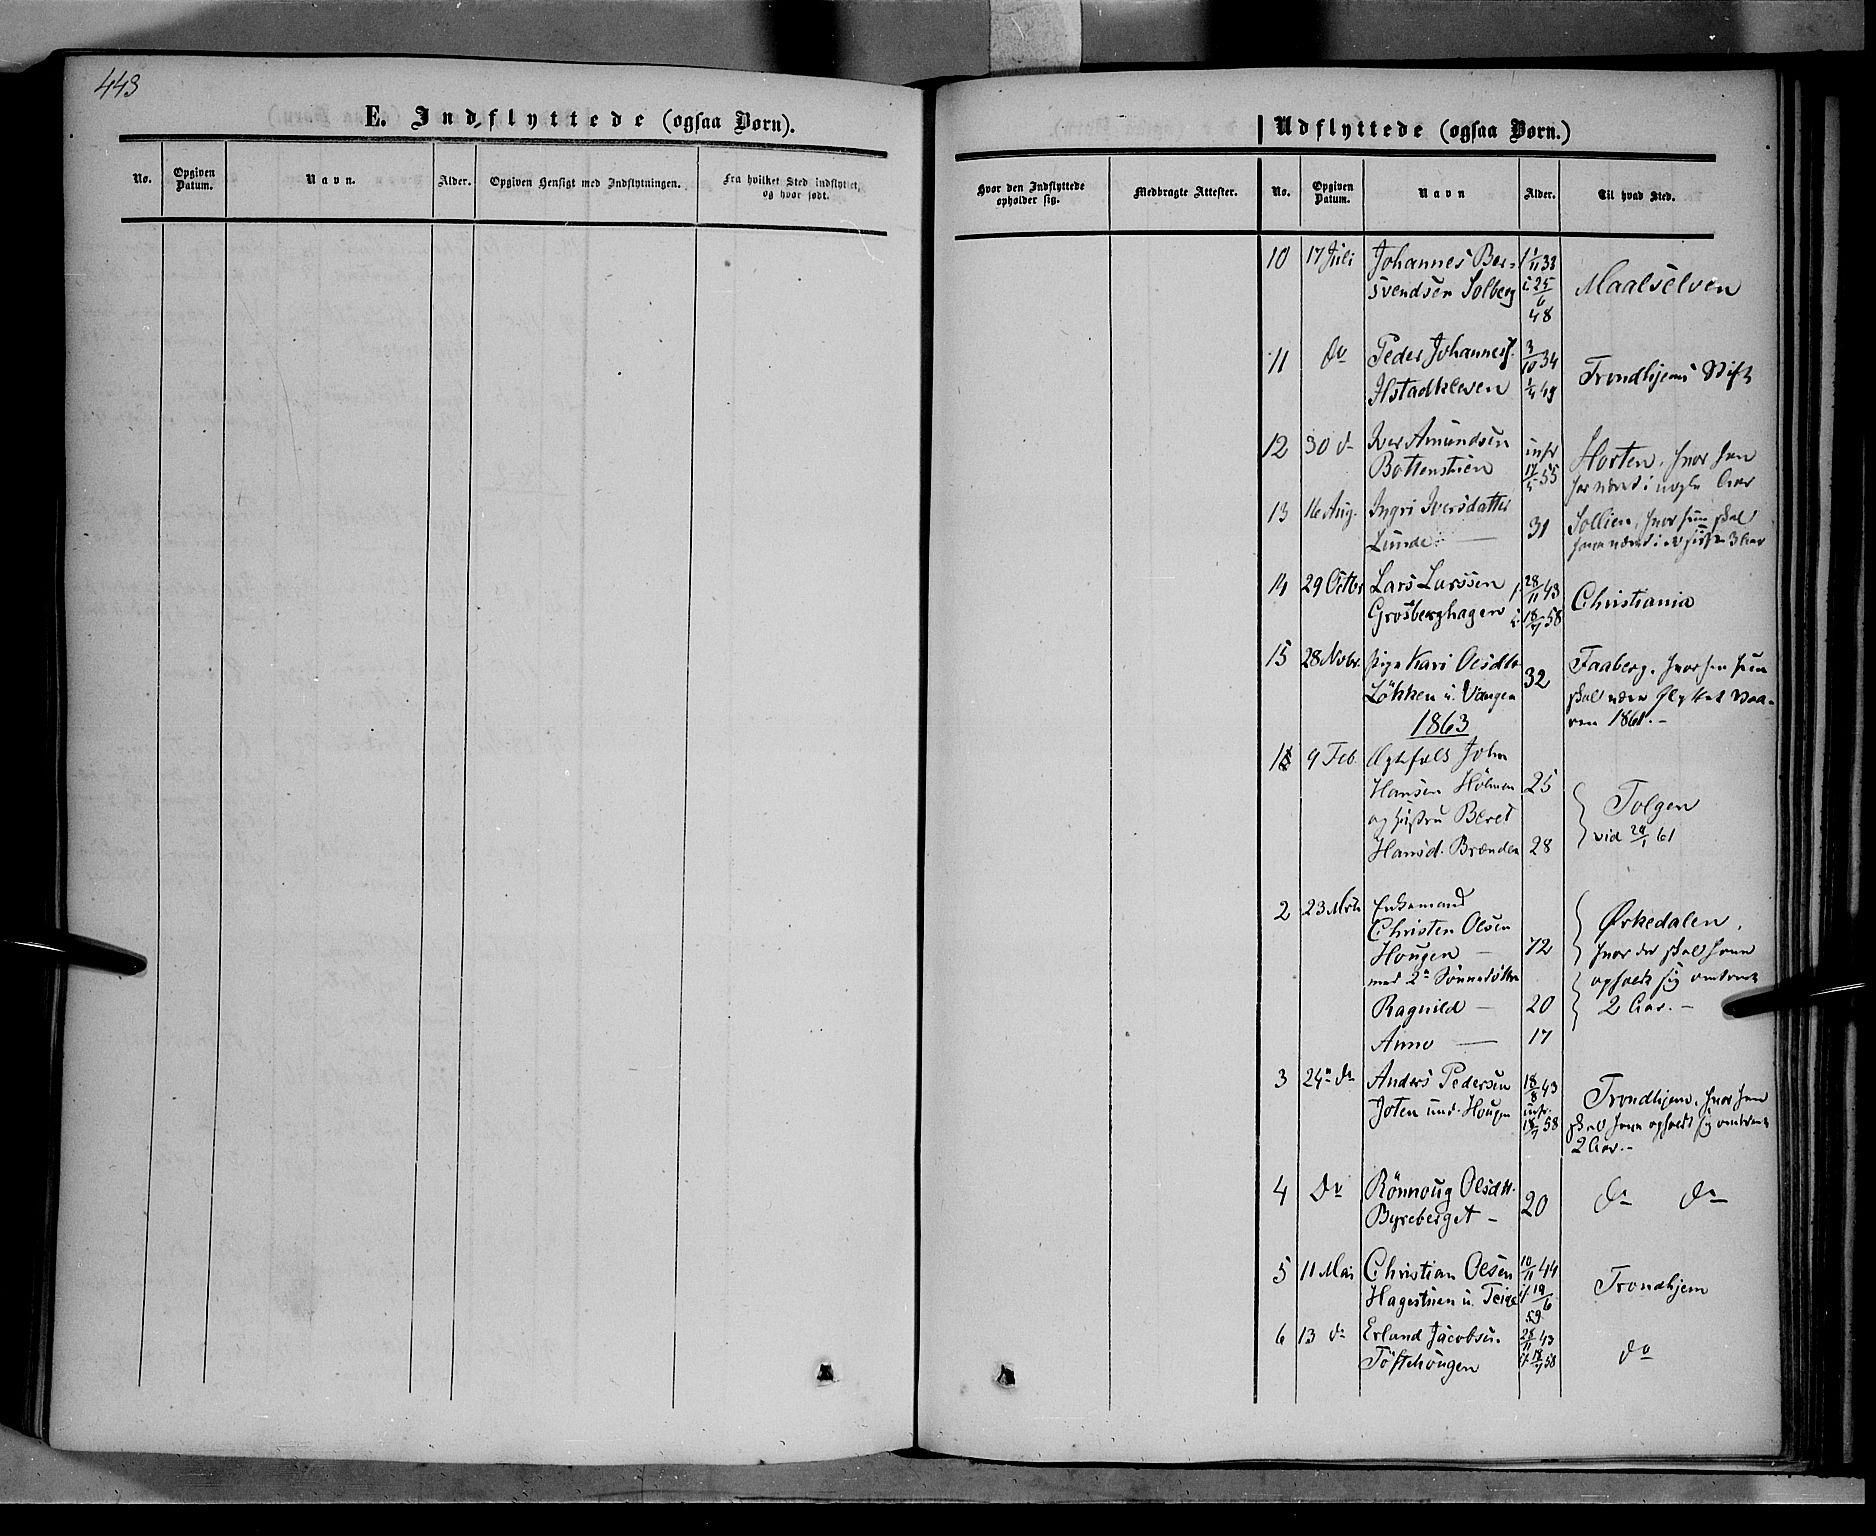 SAH, Nord-Fron prestekontor, Ministerialbok nr. 1, 1851-1864, s. 443